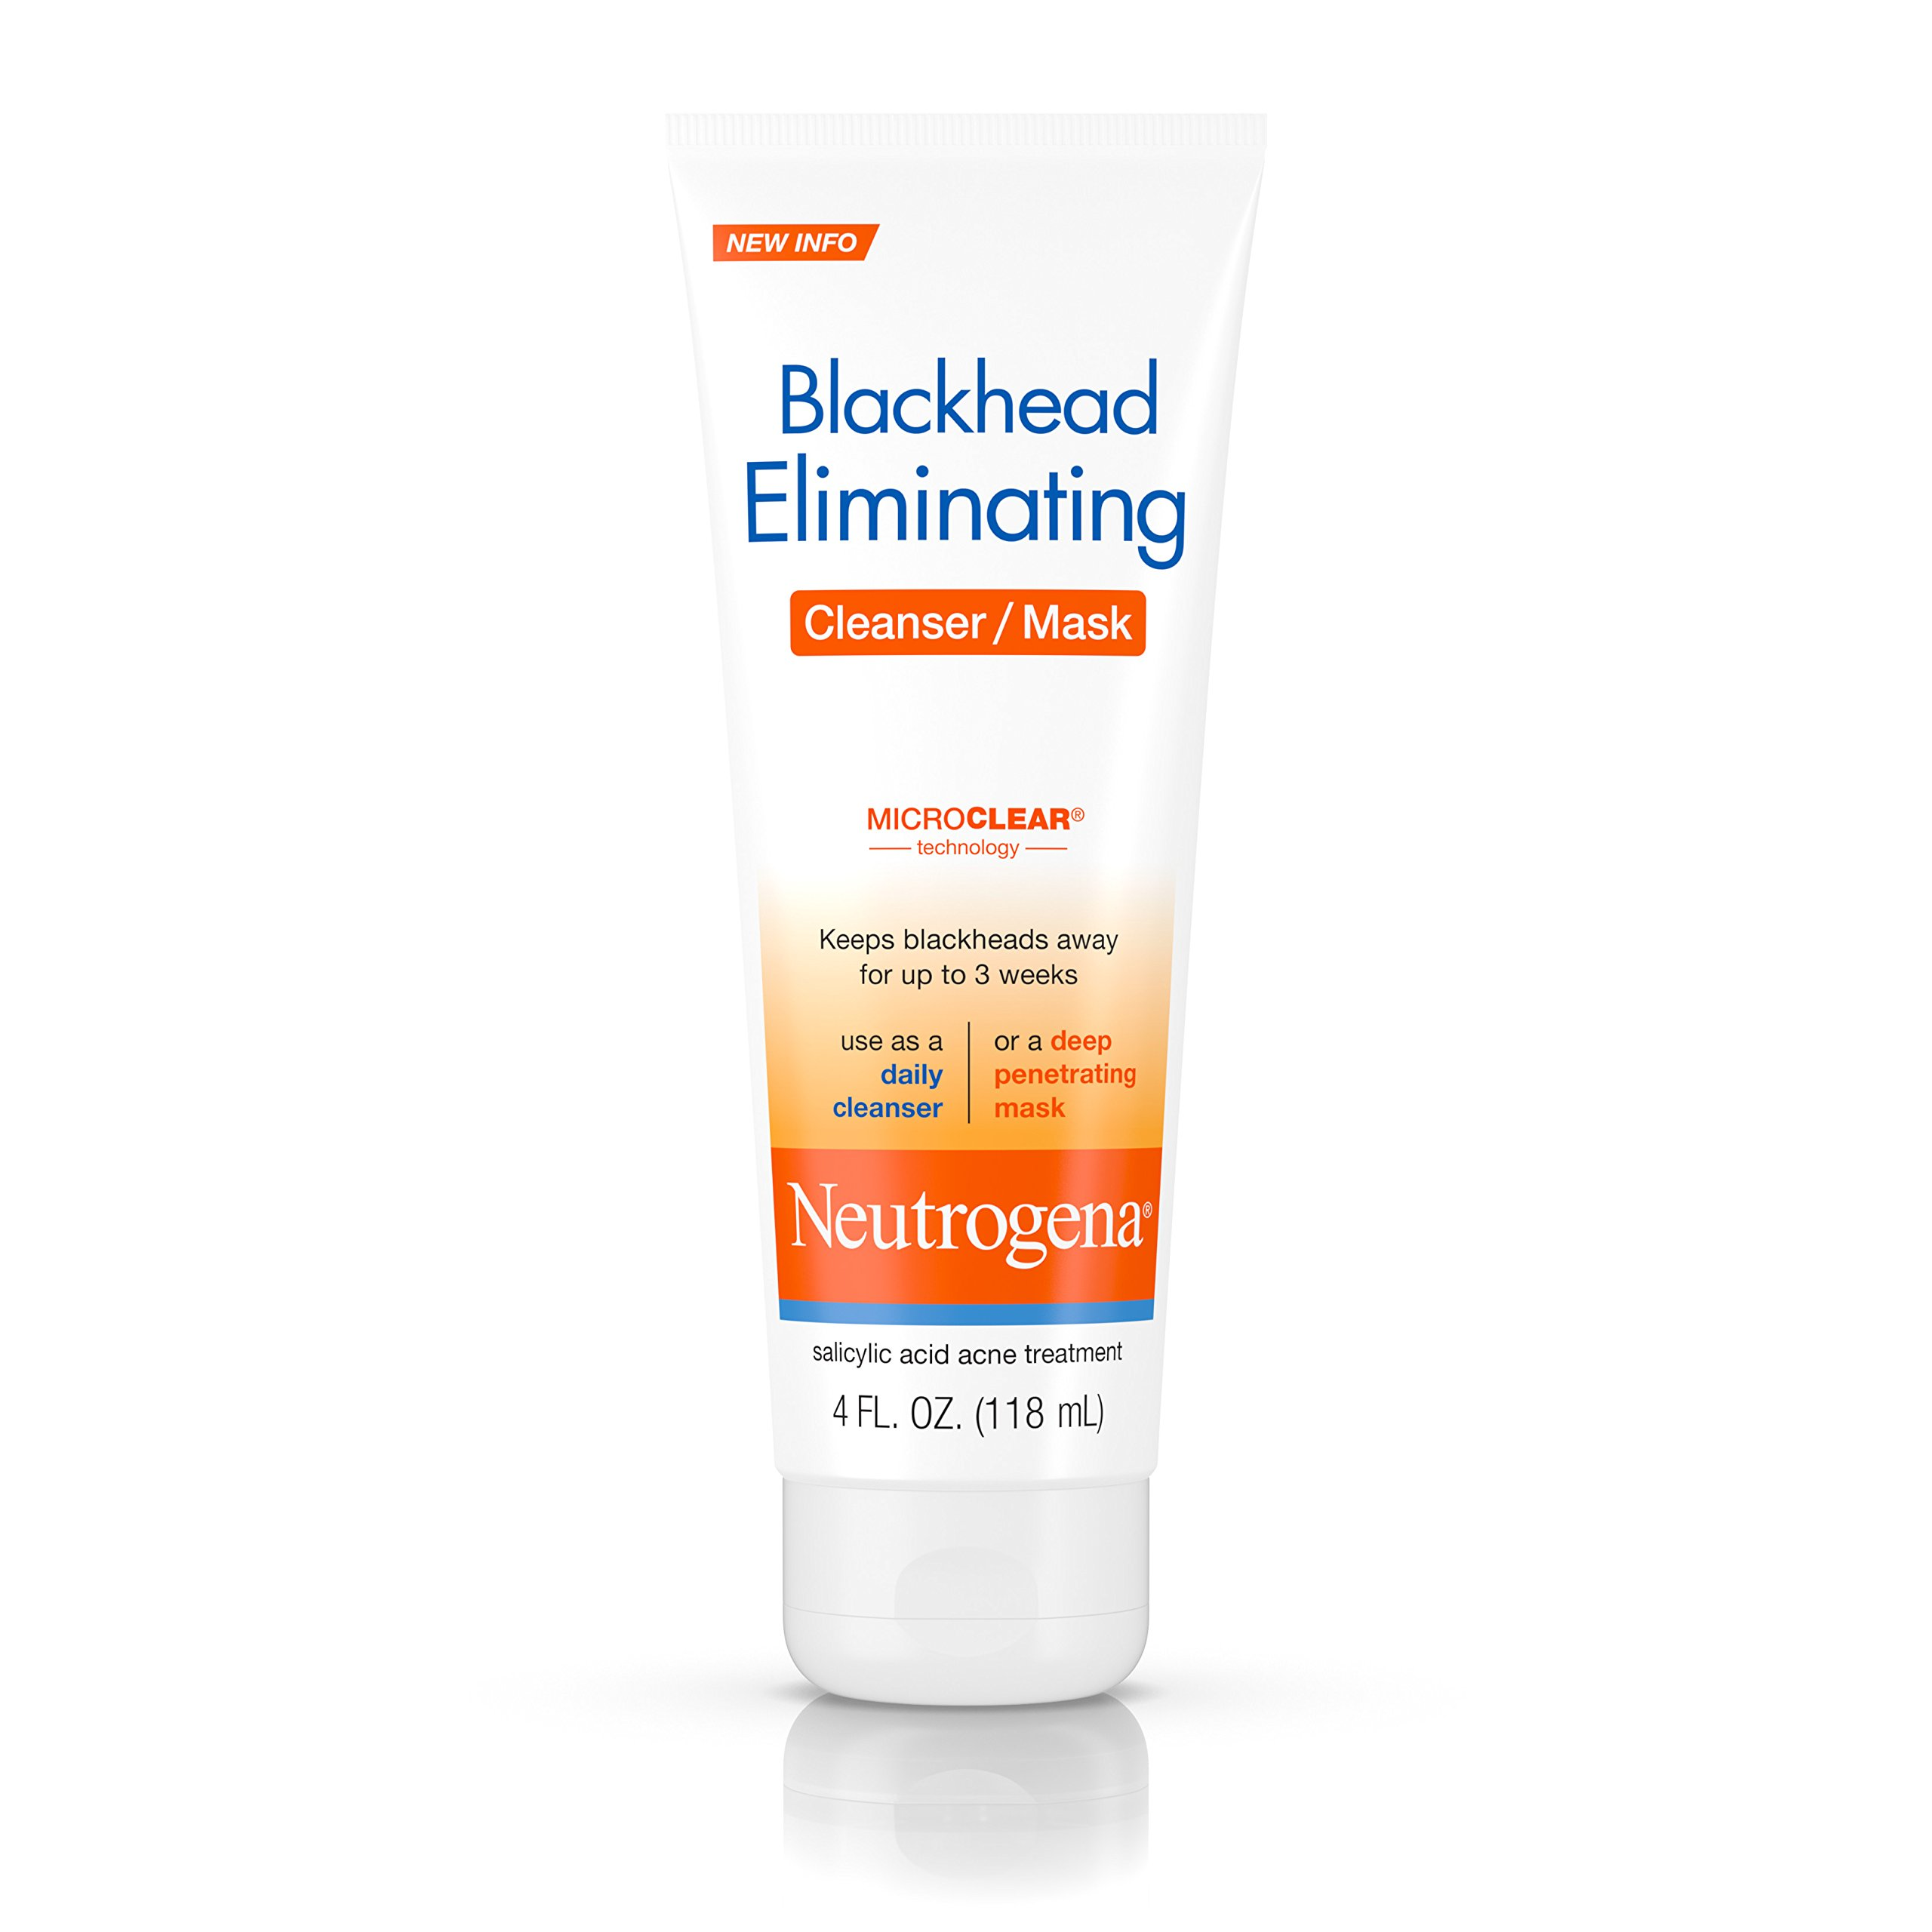 Neutrogena Blackhead Eliminating Cleanser/Mask, 4 Fluid Ounce (Pack of 3)